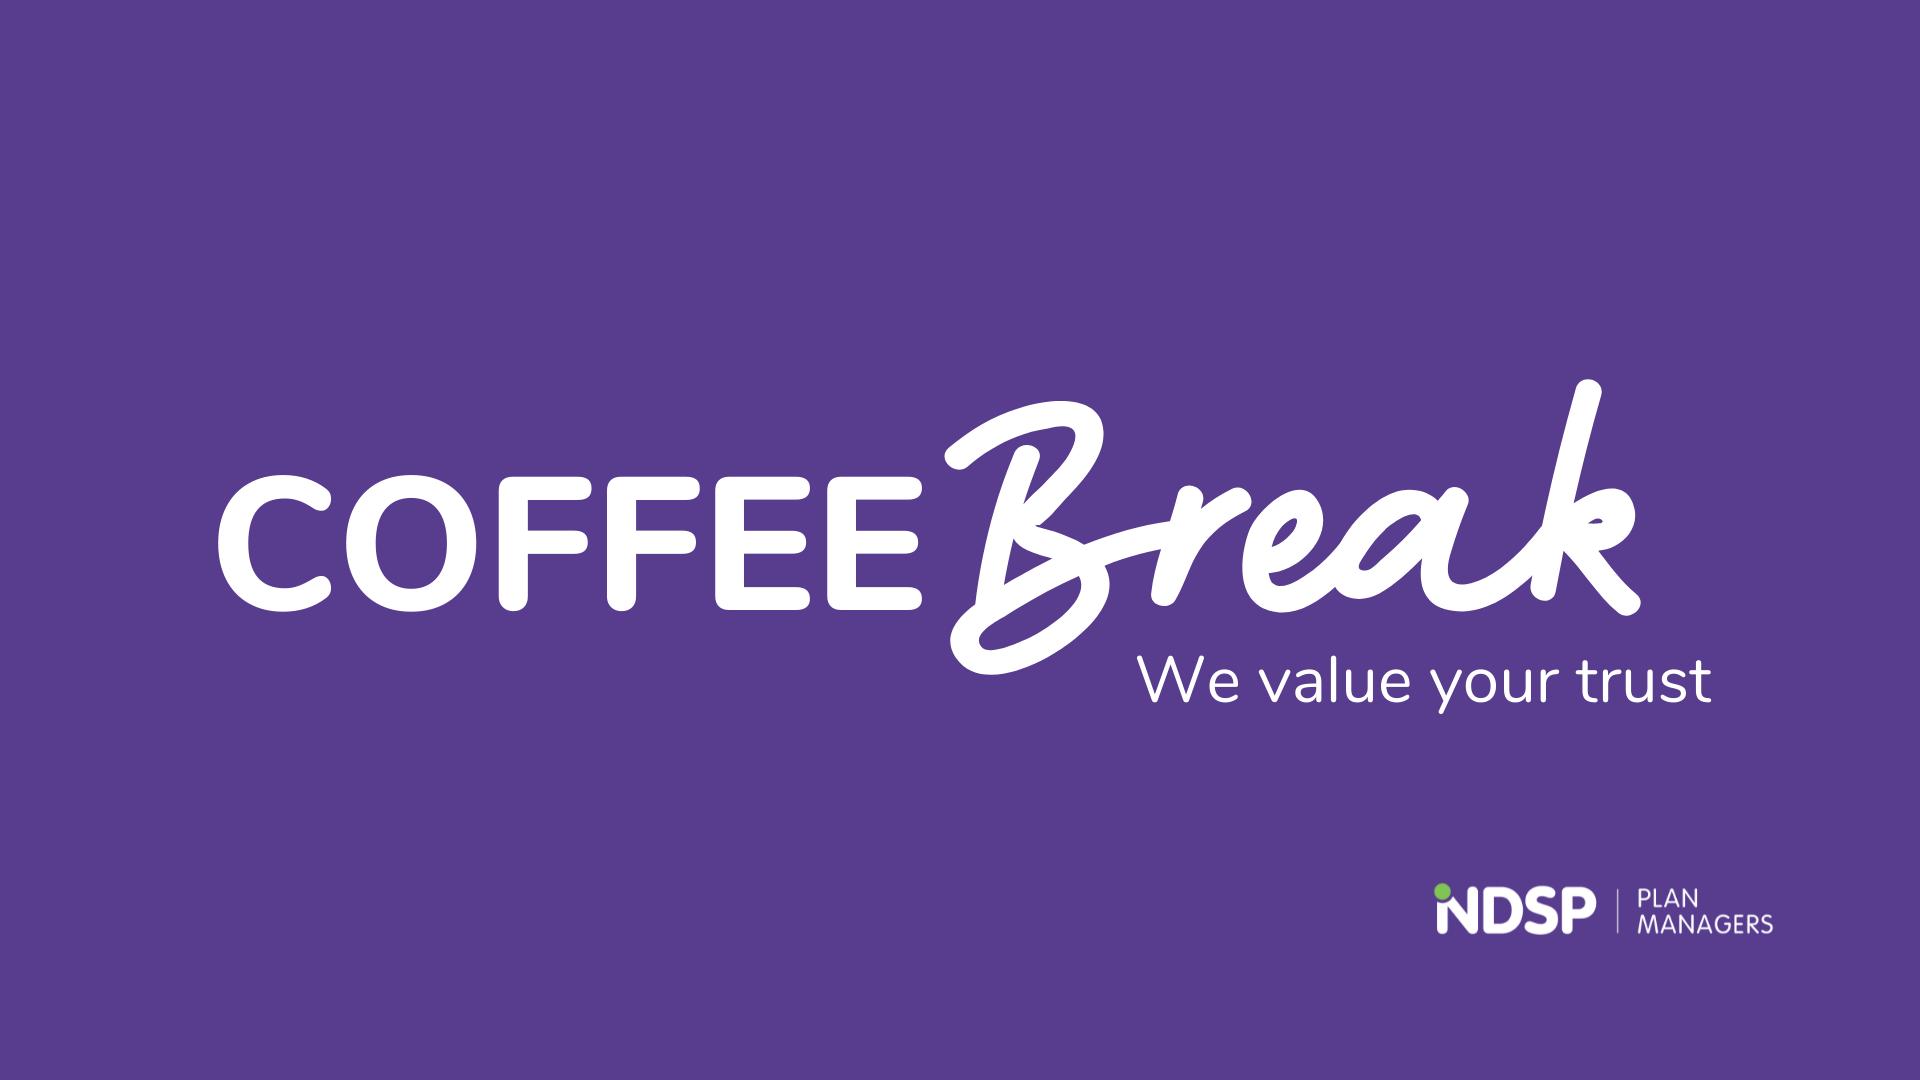 coffee break we value trust ndsp plan managers